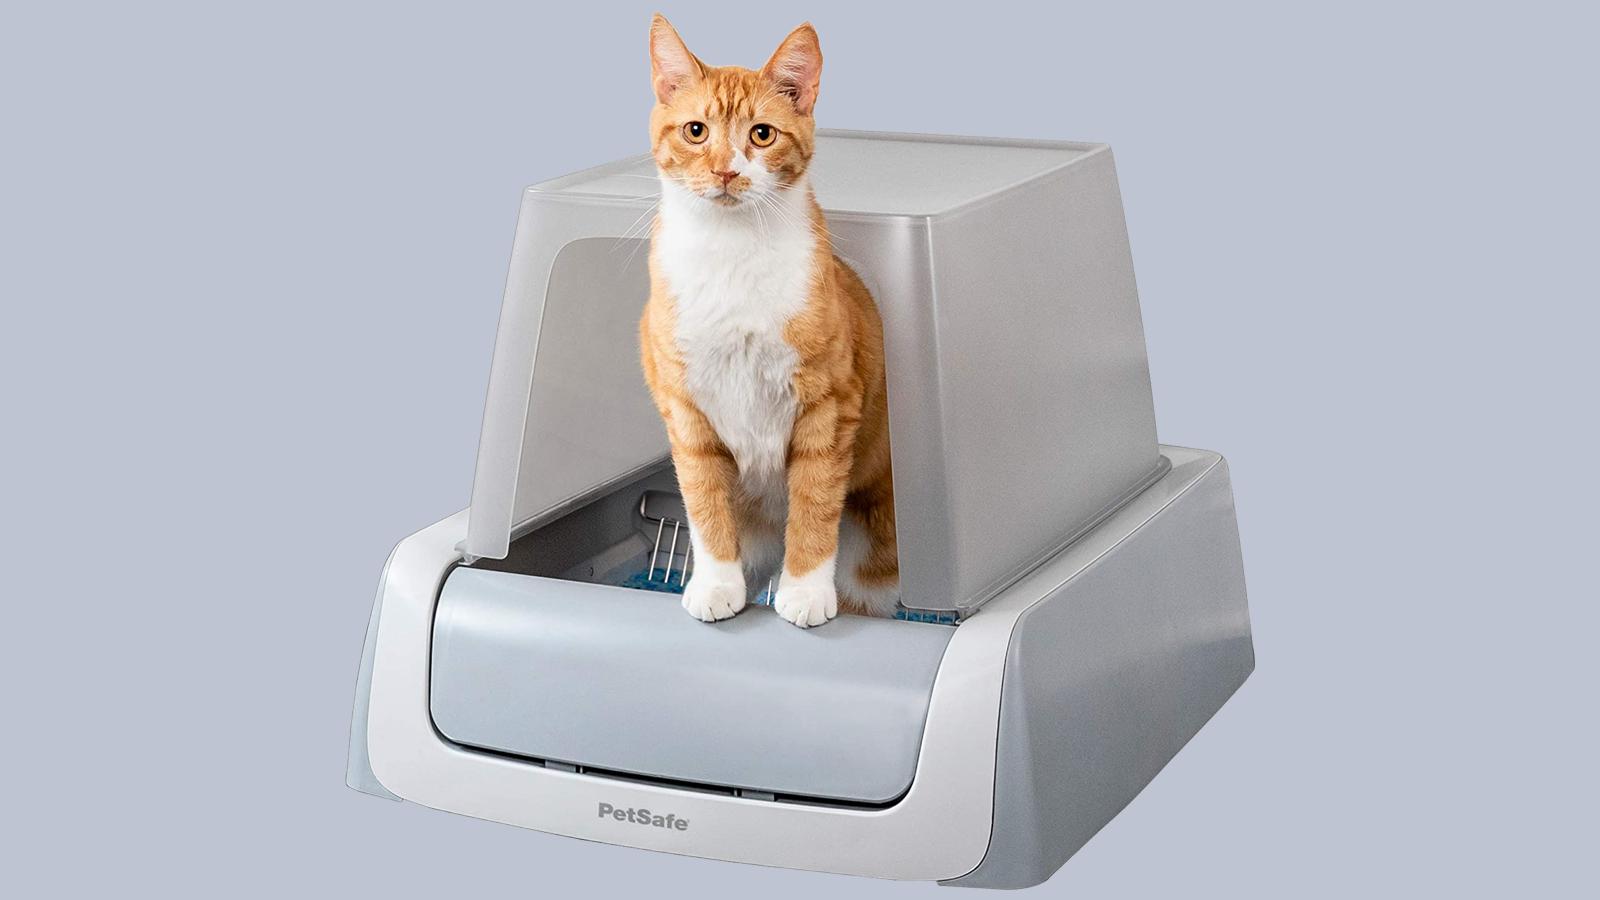 Cat exiting PetSafe Self-Cleaning Litter Box